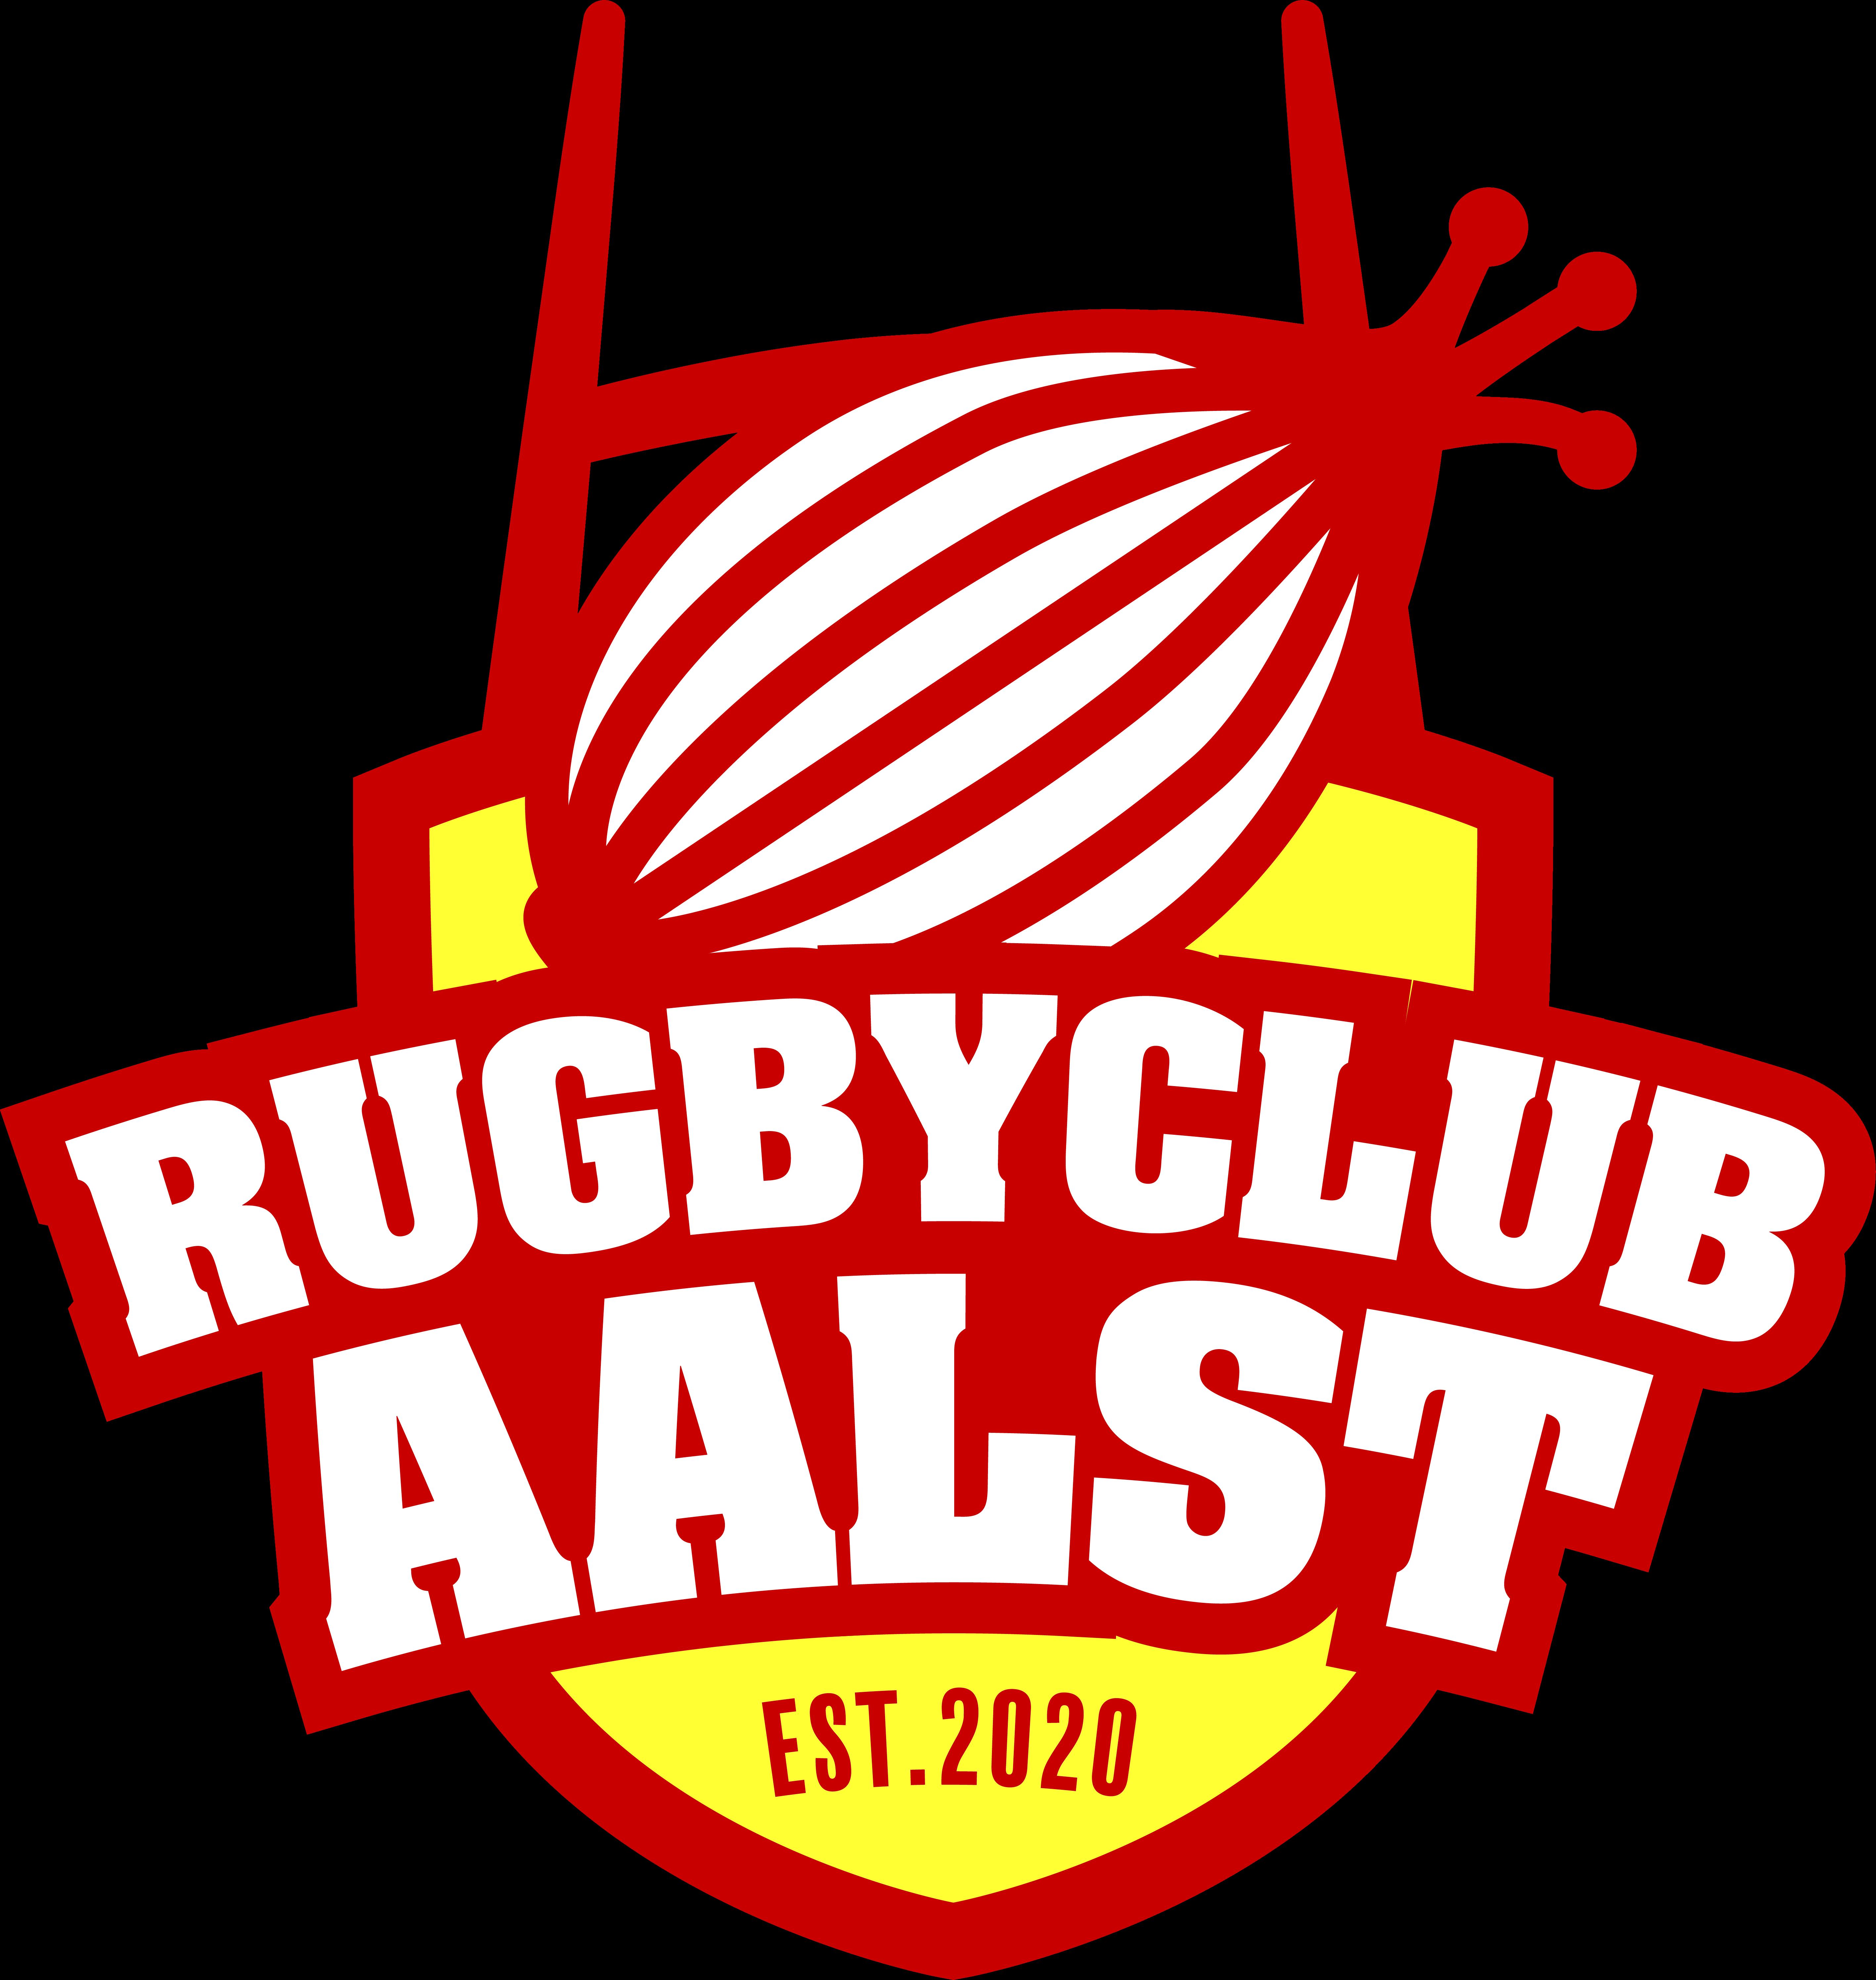 Rugbyclub Aalst